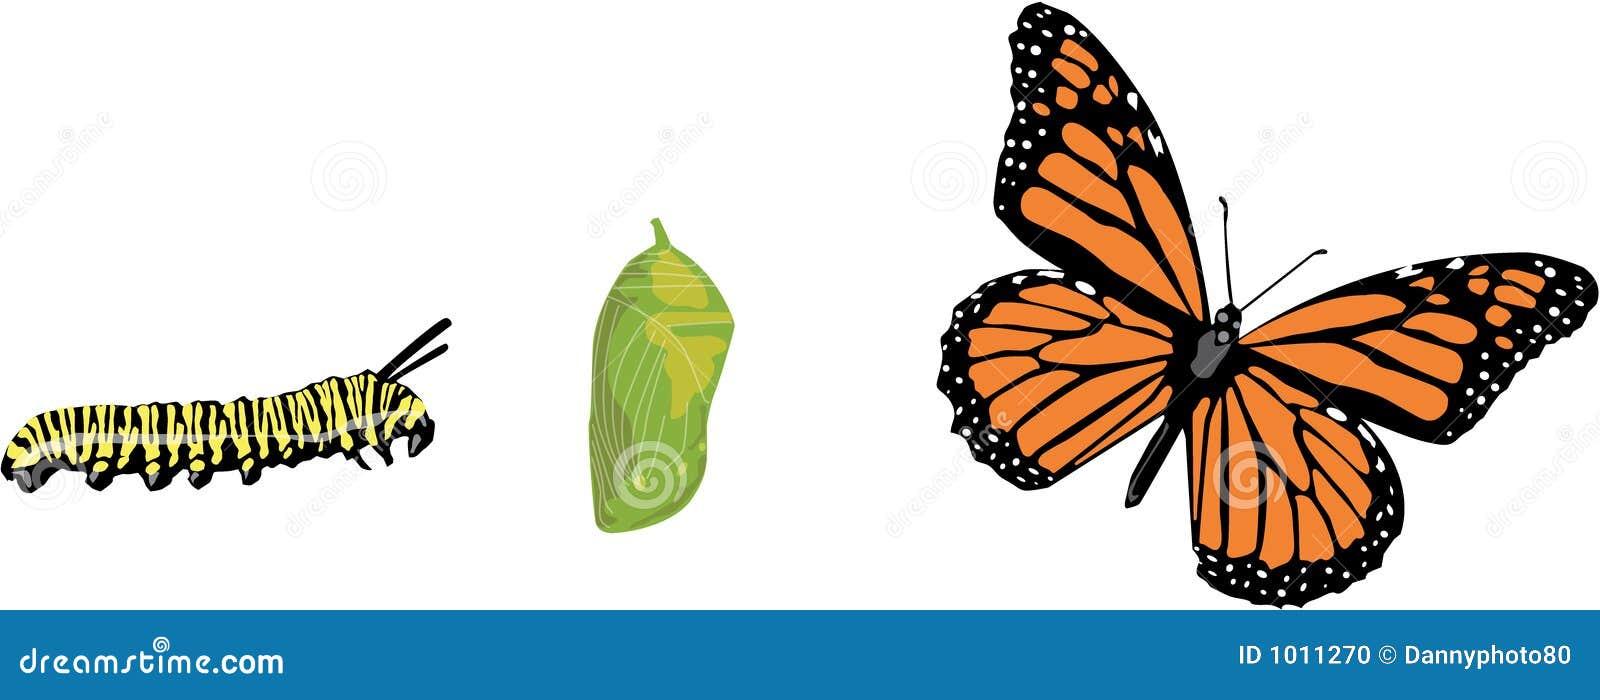 Ciclo vital de la mariposa